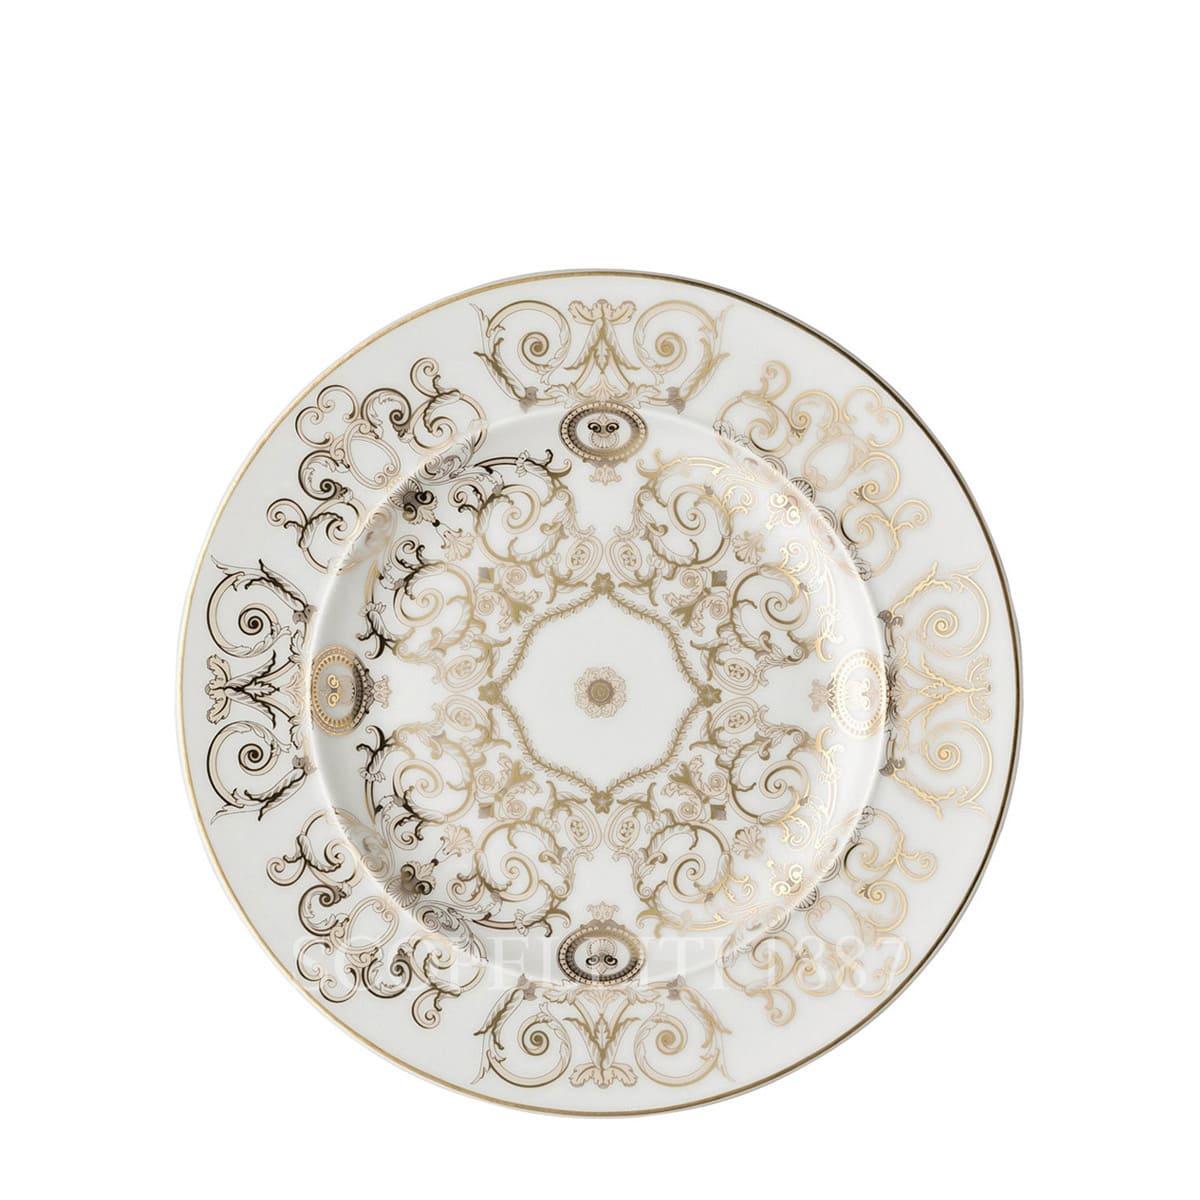 Bomboniera Versace Piattino 18 cm Medusa Gala di Rosenthal Versace